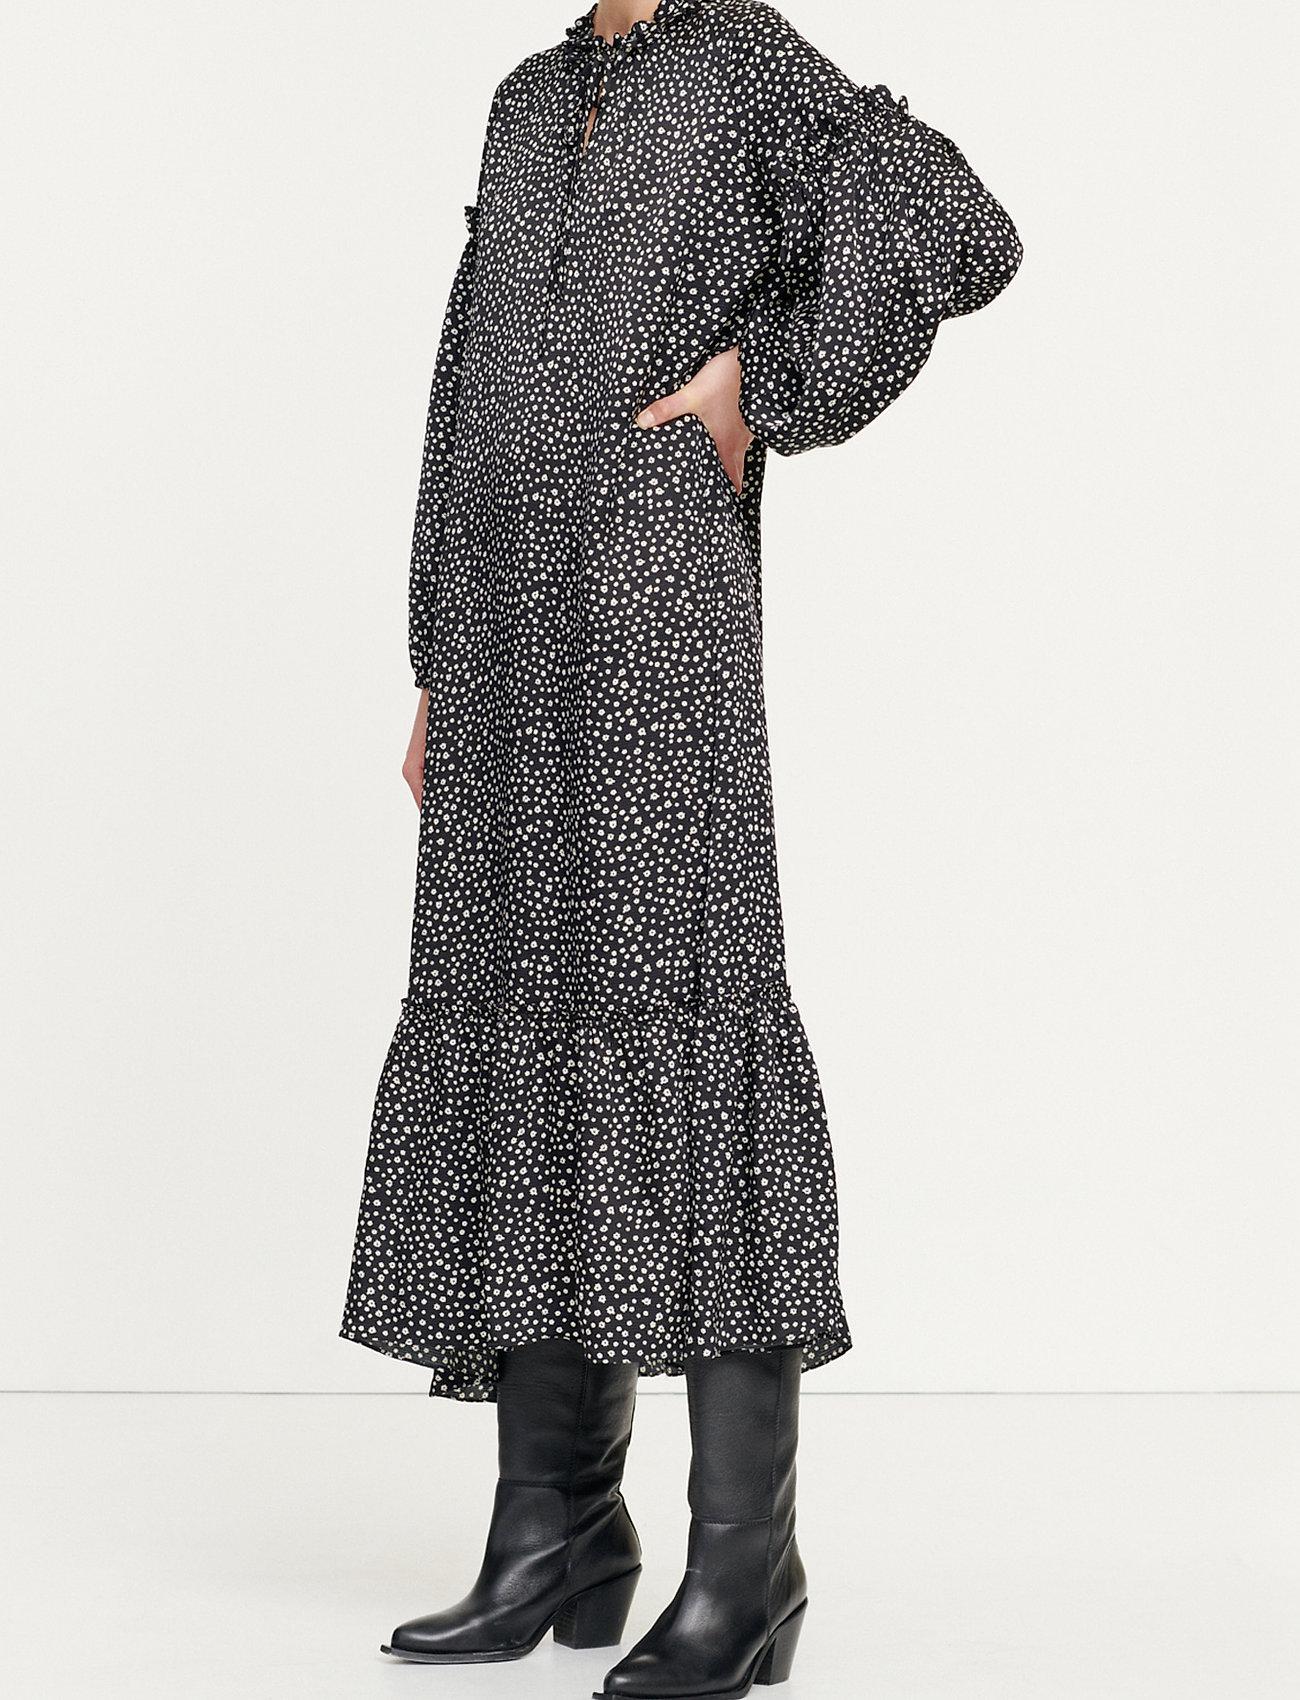 Samsøe Samsøe Vivre dress aop 12887 - Dresses BLACK BLOSSOM